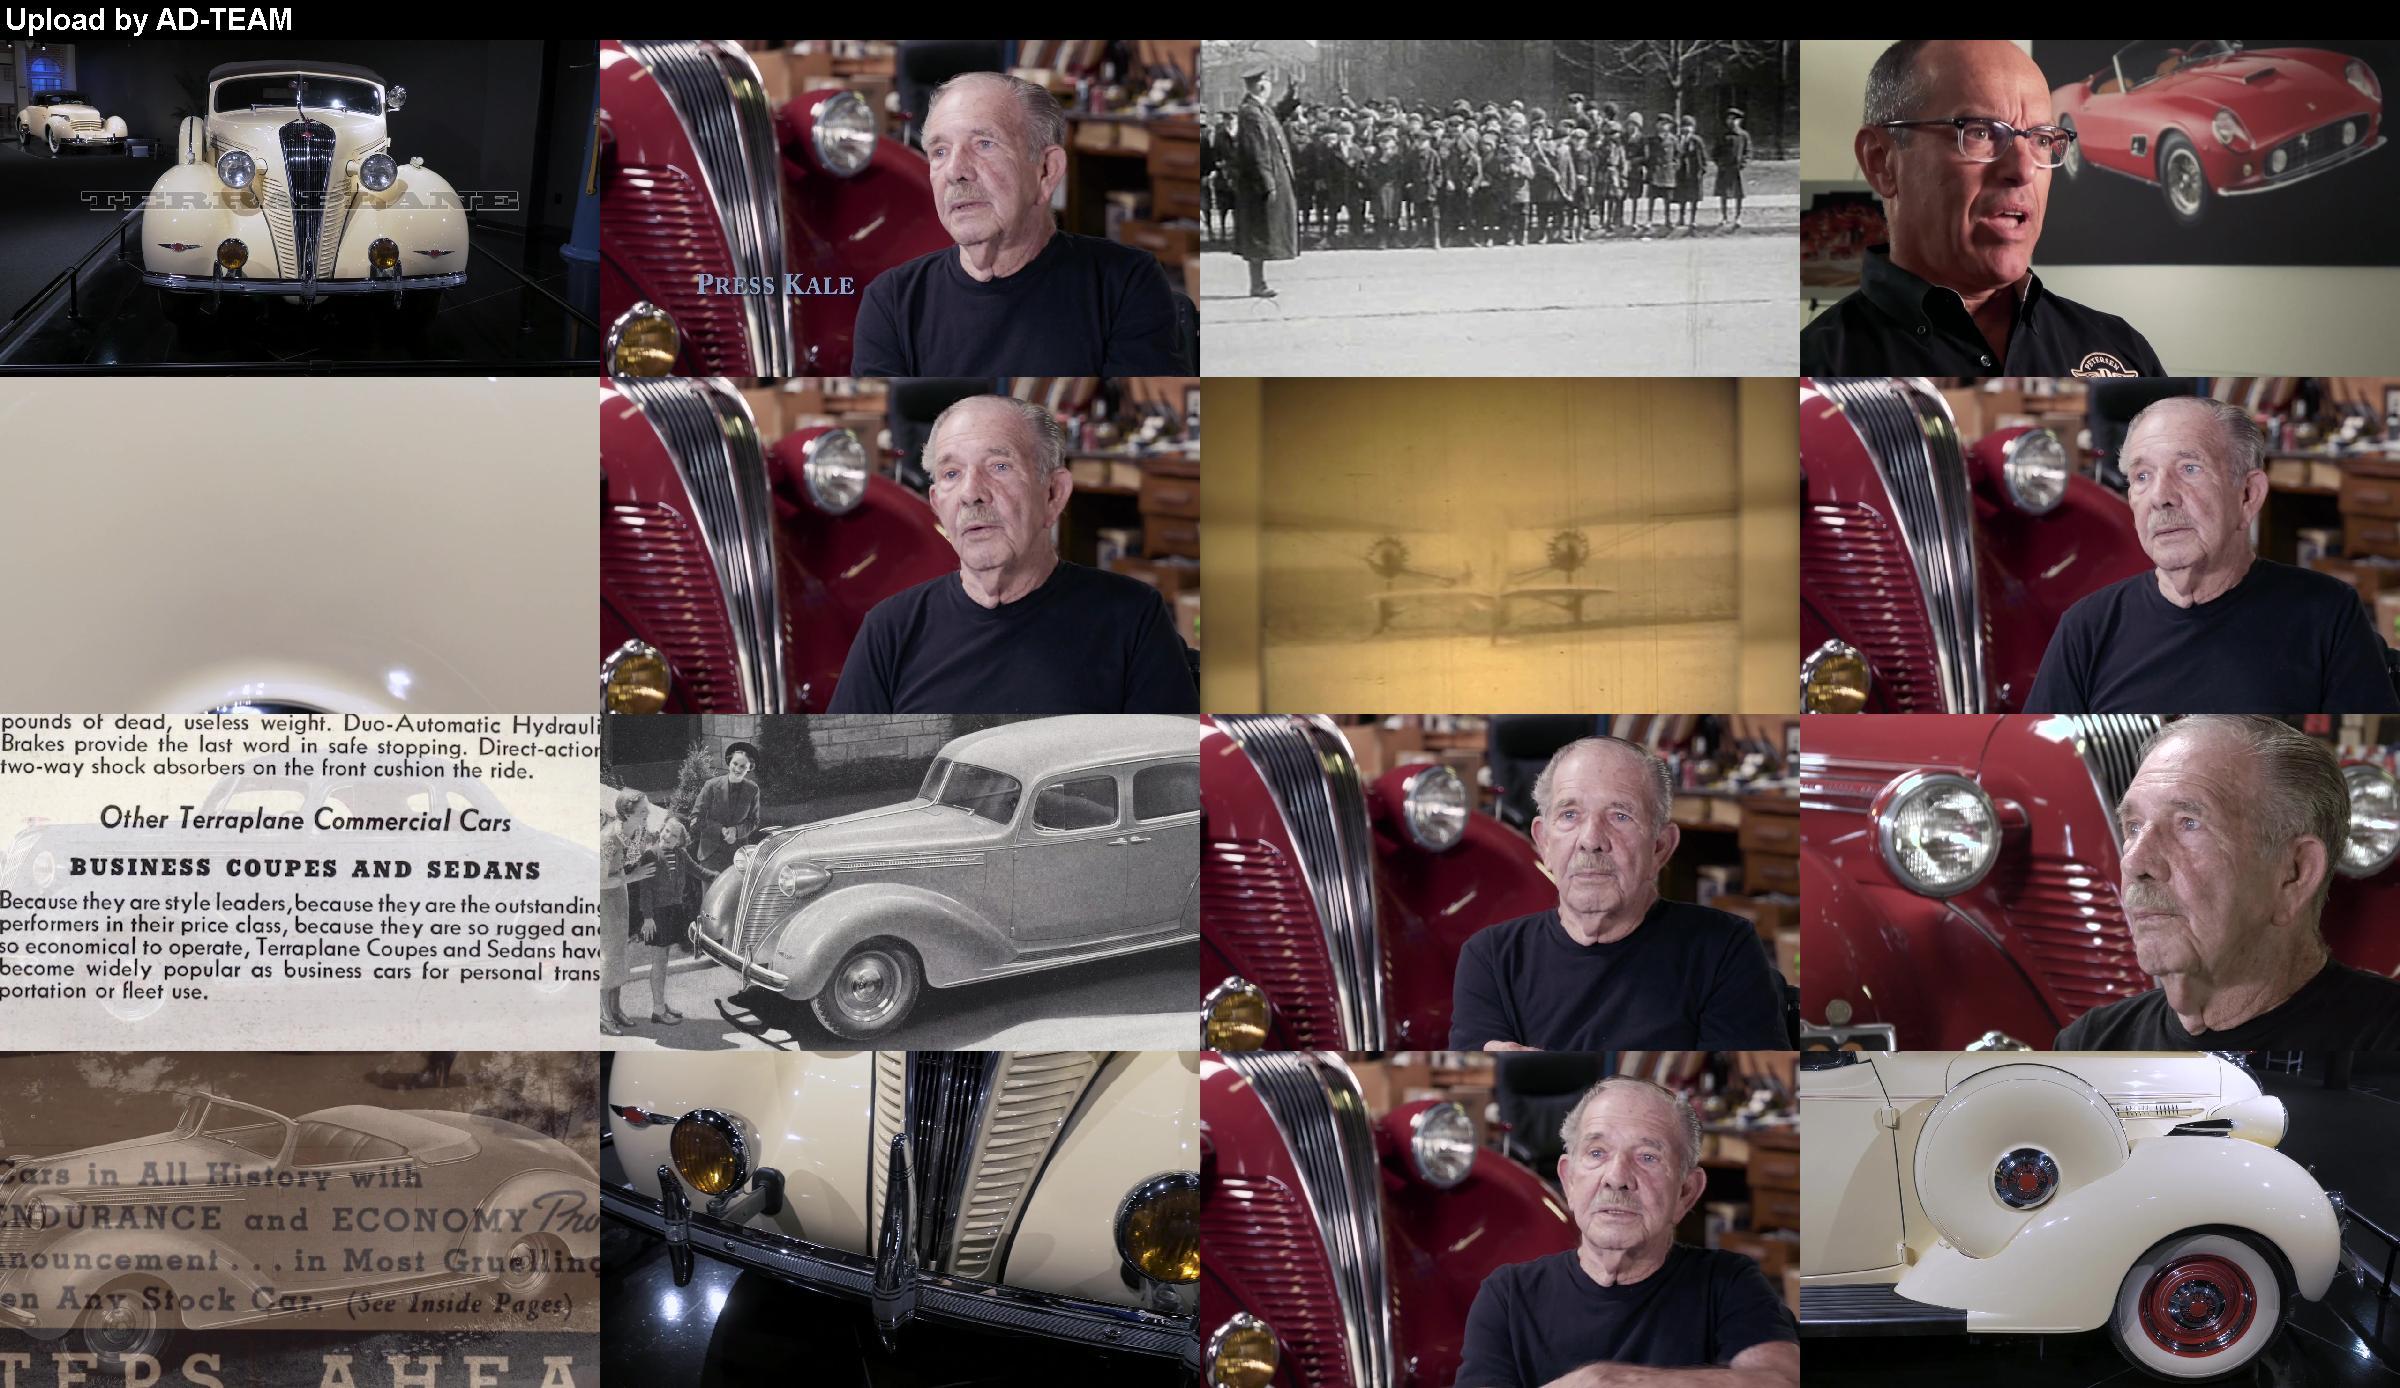 Classic Cars S01e03 720p Webrip X264-tvillage